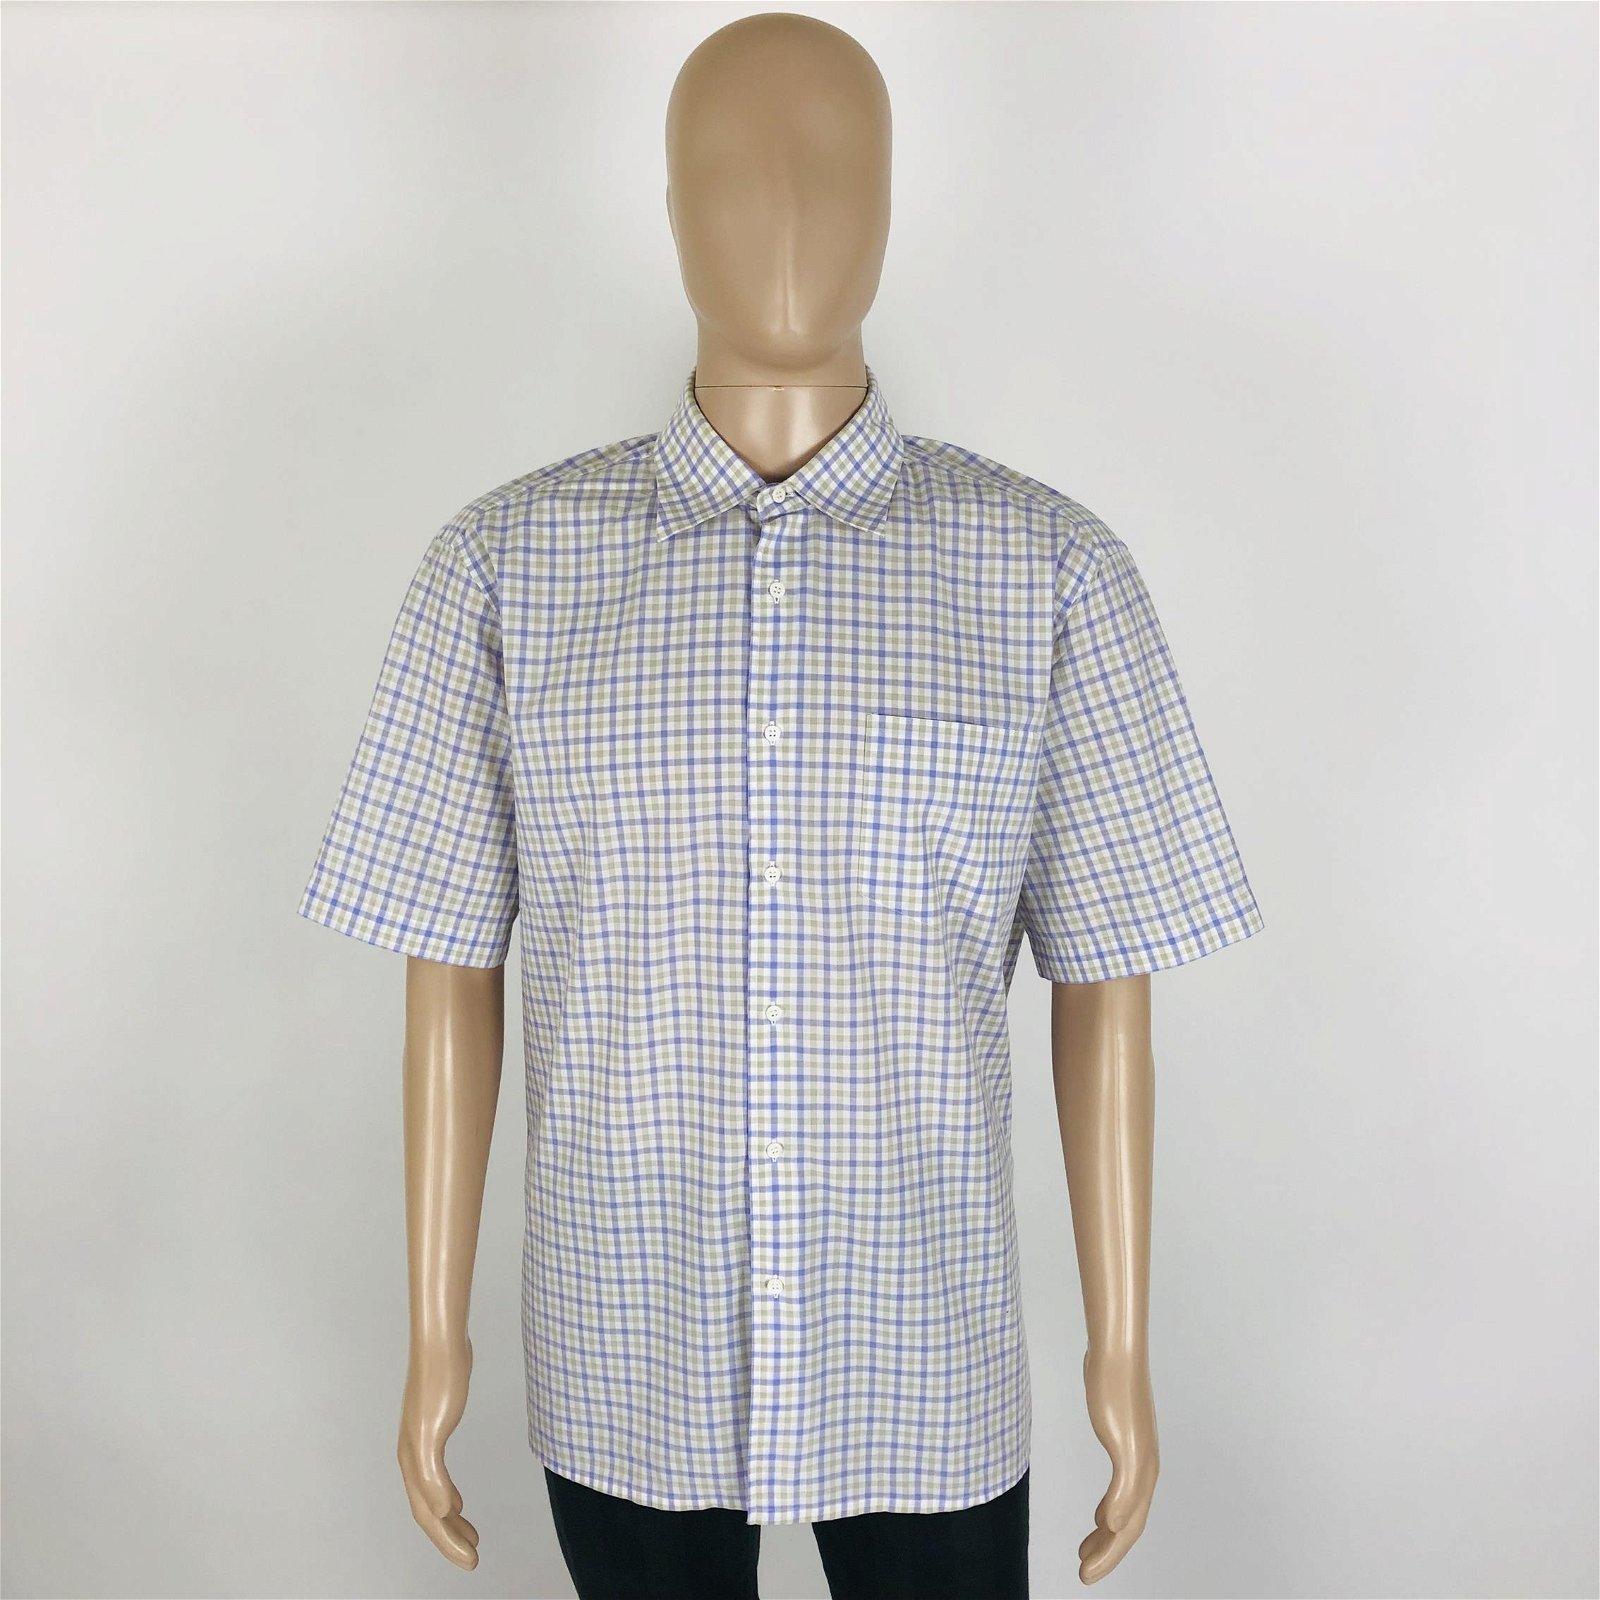 Men's Hugo Boss Regular Short Sleeve Shirt Top